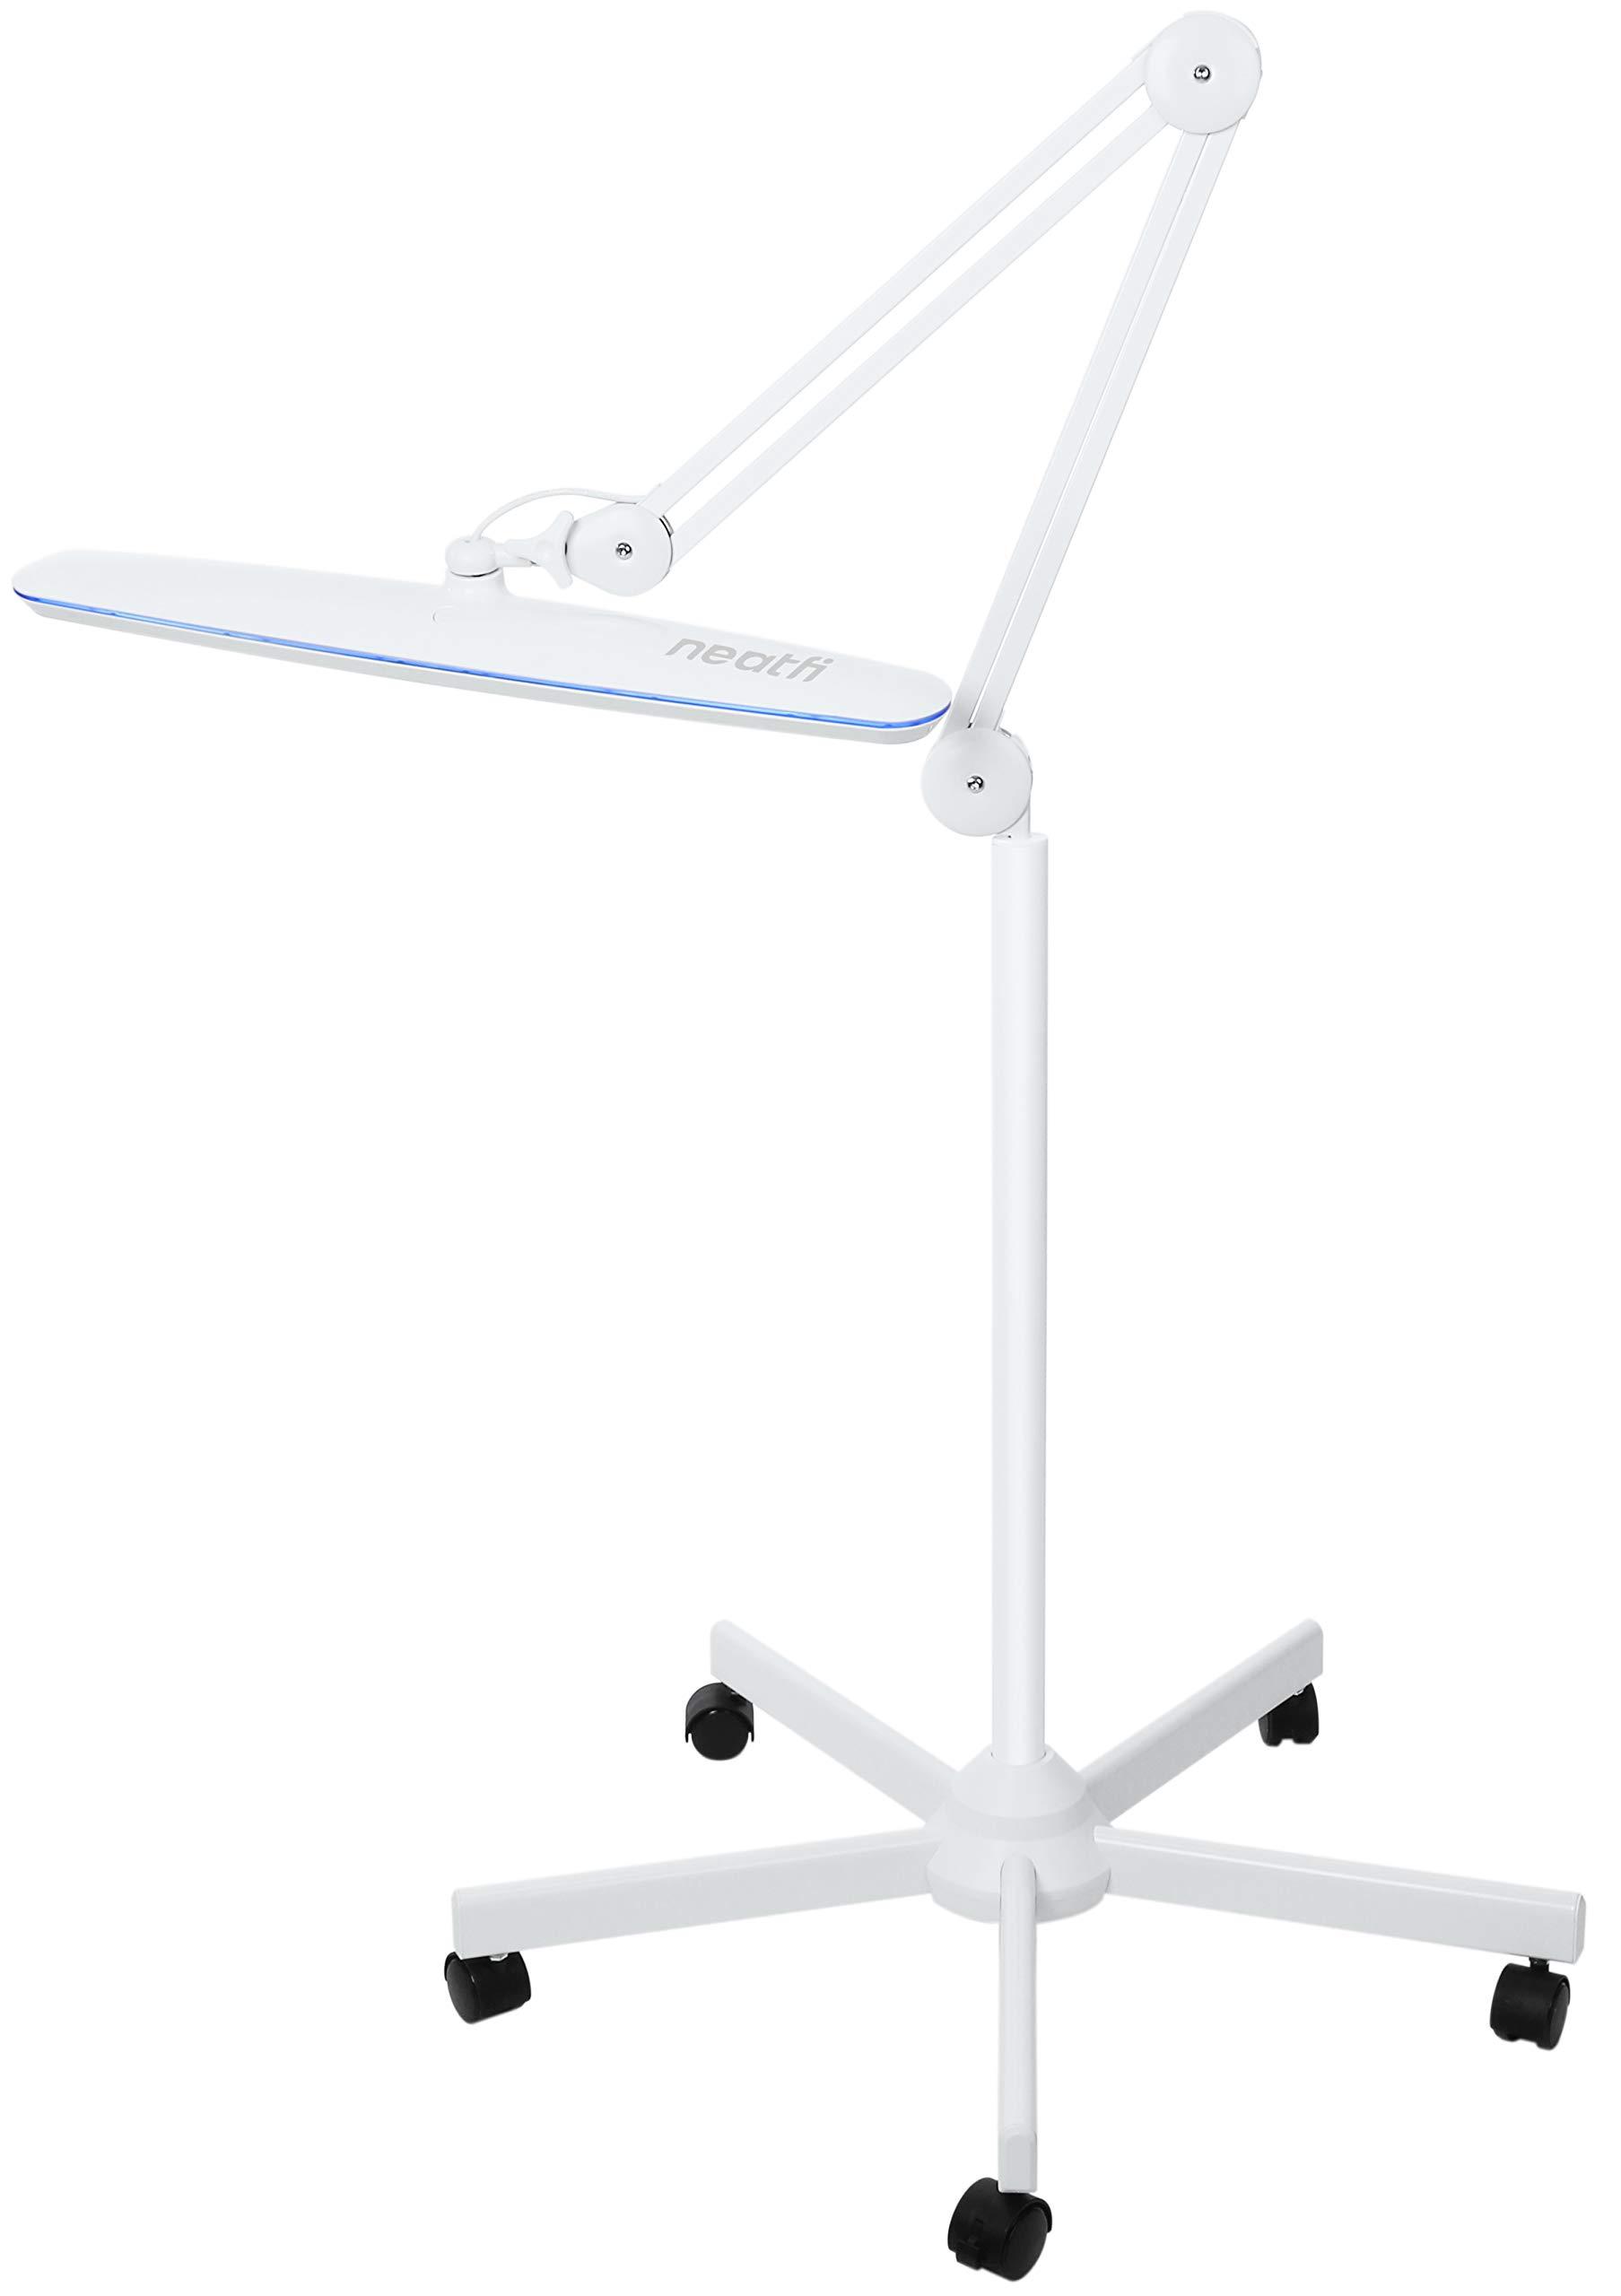 "Neatfi XL 2,200 Lumens LED Task Lamp with Floor Stand | 24W | 117PCS SMD LED | 23"" Ultra Wide Lamp | 4-Level Brightness Dimmable | Eye-Caring LED Lamp | Glare Free | 5 Wheel Rolling Base"